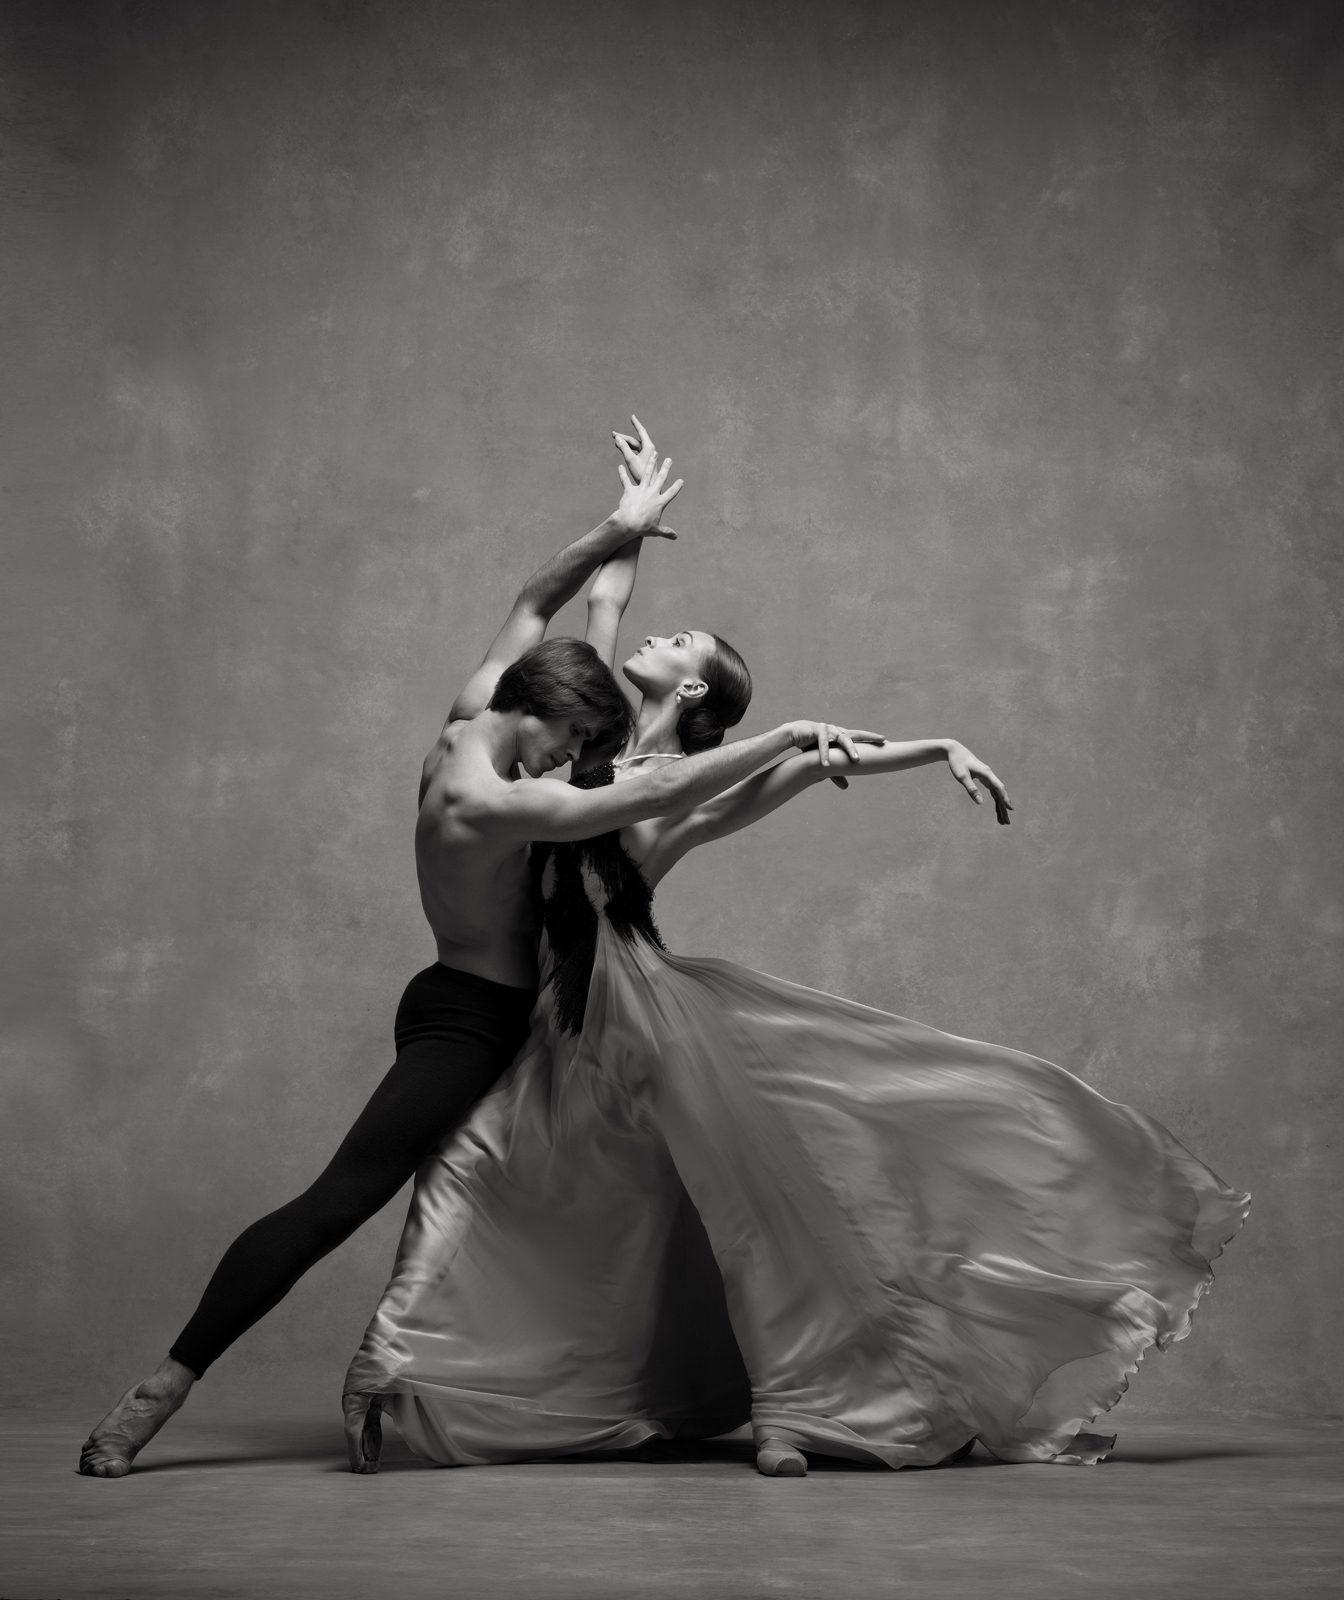 Artem Ovcharenko and Olga Smirnova, Principal dancers, Bolshoi Ballet